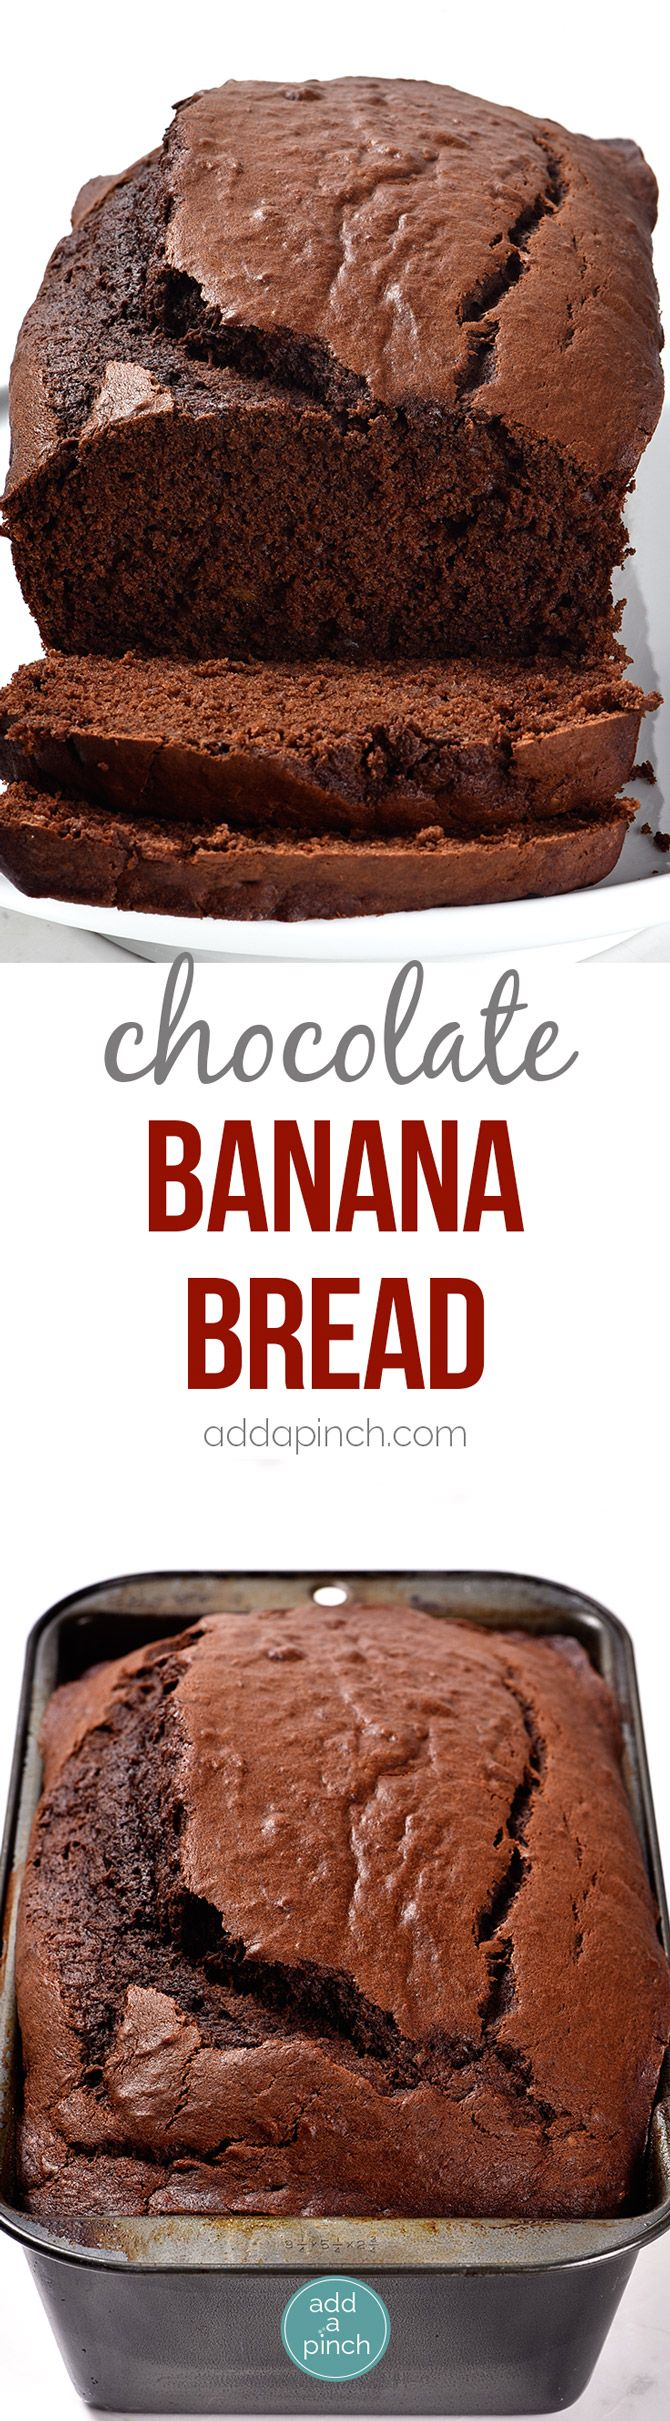 Chocolate Banana Bread Recipe - Take your banana bread to a whole new ...